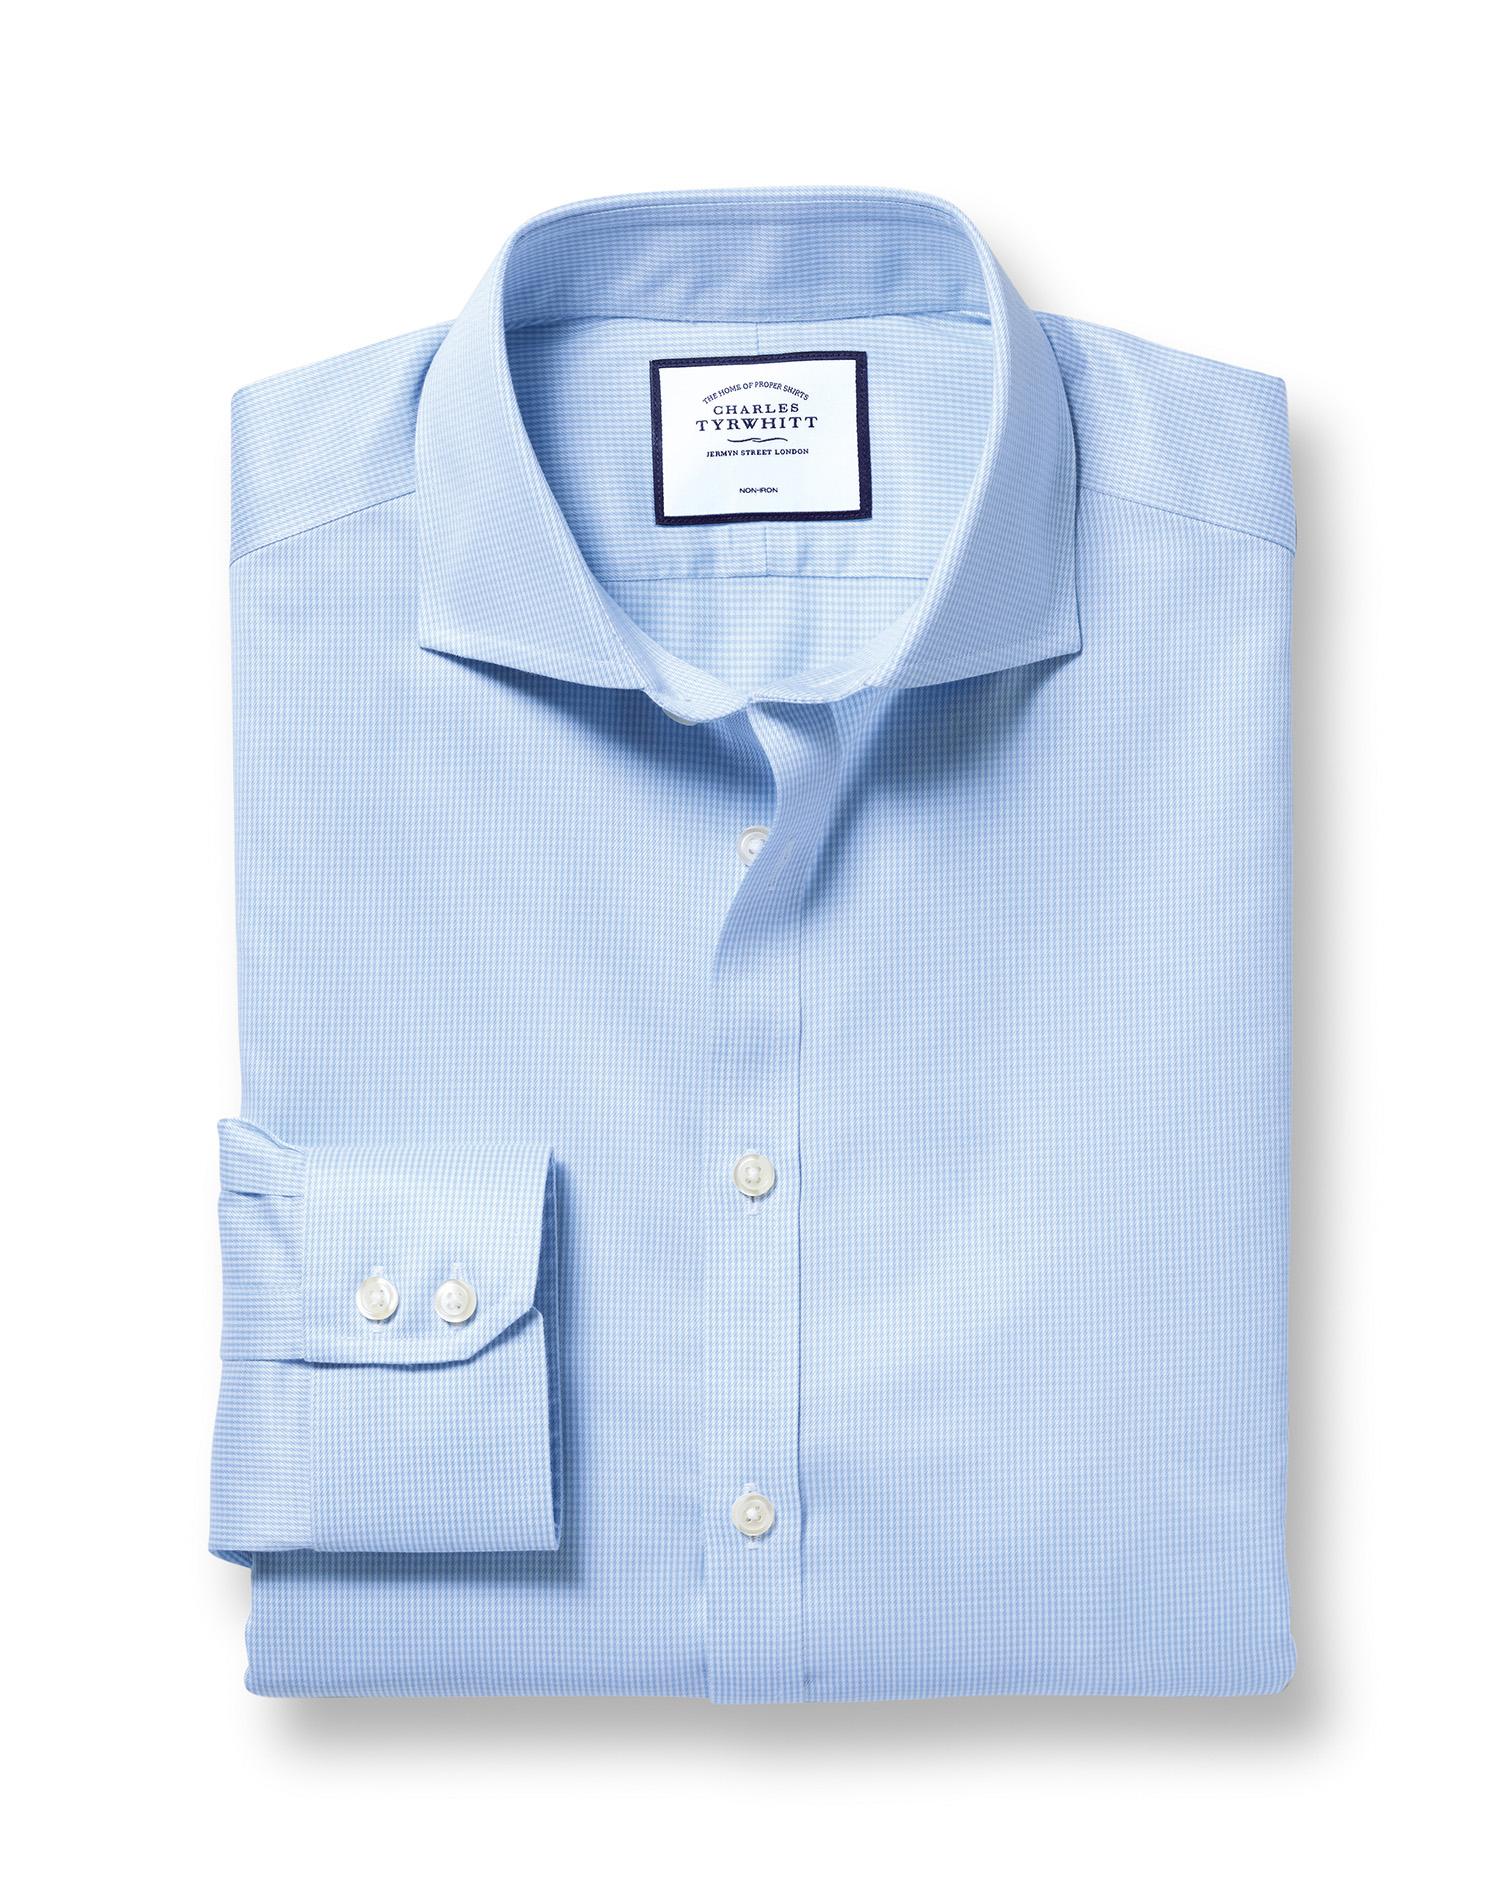 Cotton Slim Fit Non-Iron Cutaway Sky Blue Puppytooth Shirt